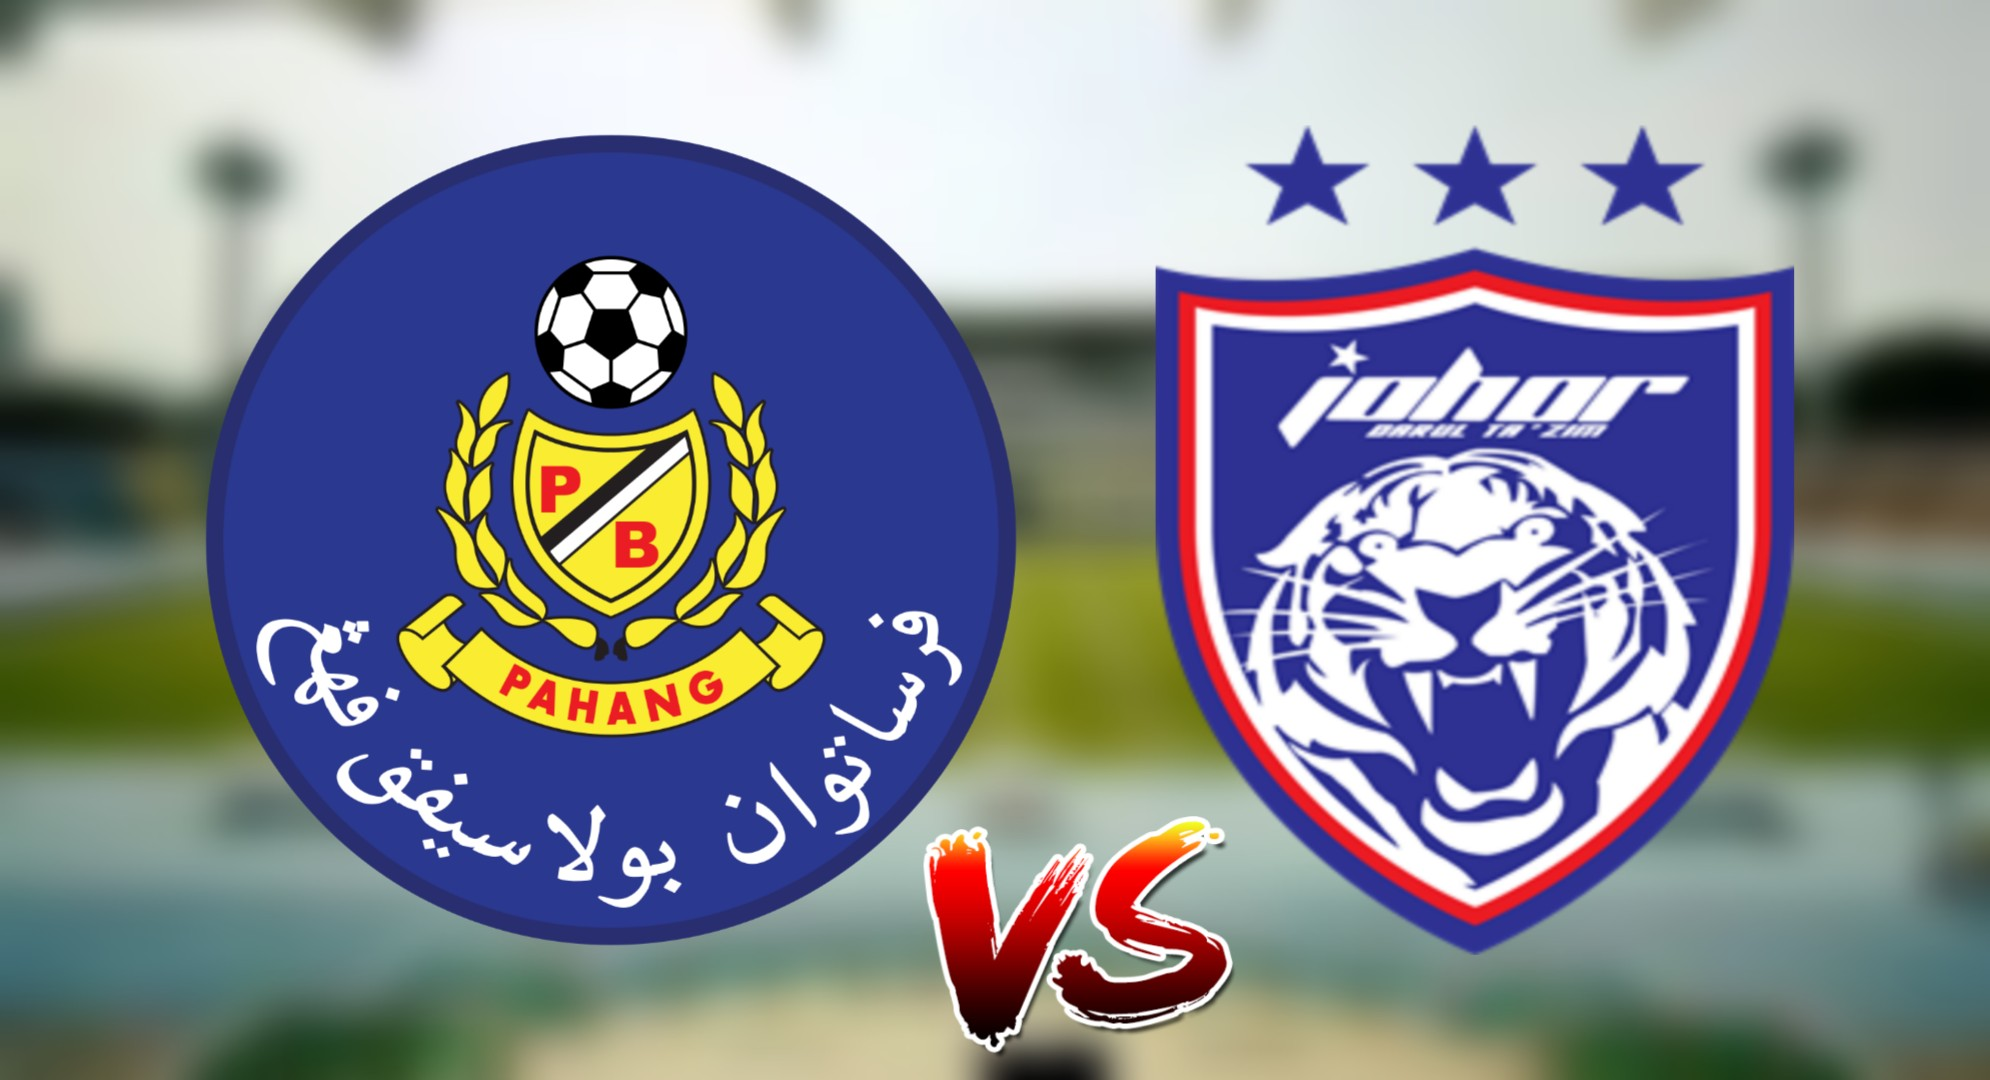 Live Streaming Pahang vs JDT 28.4.2019 Liga Super